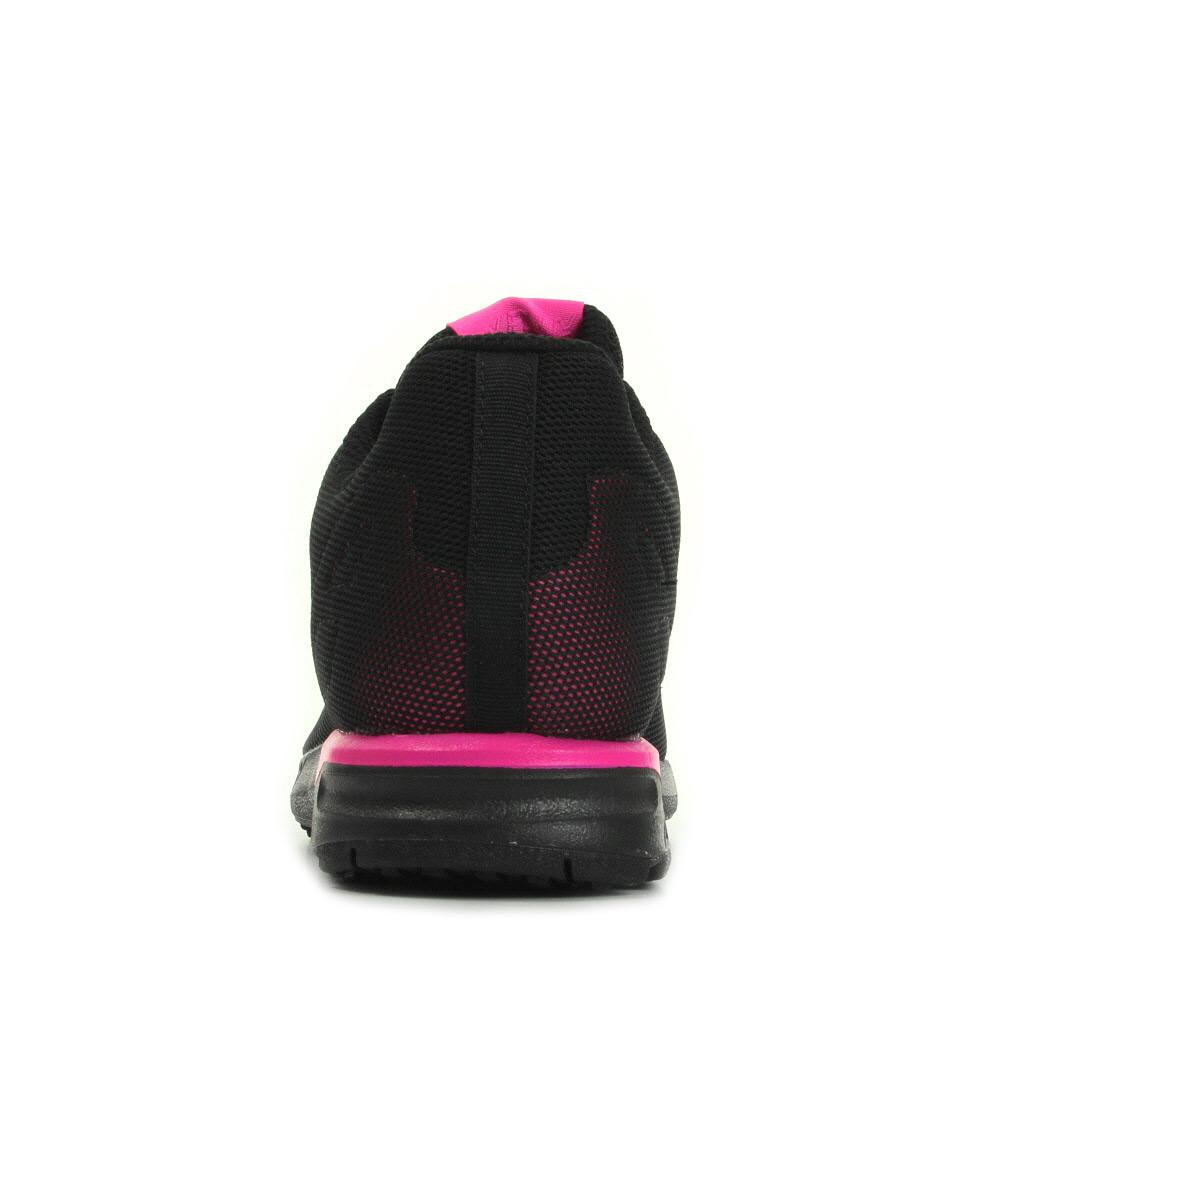 Adidas Zx Flux S74954